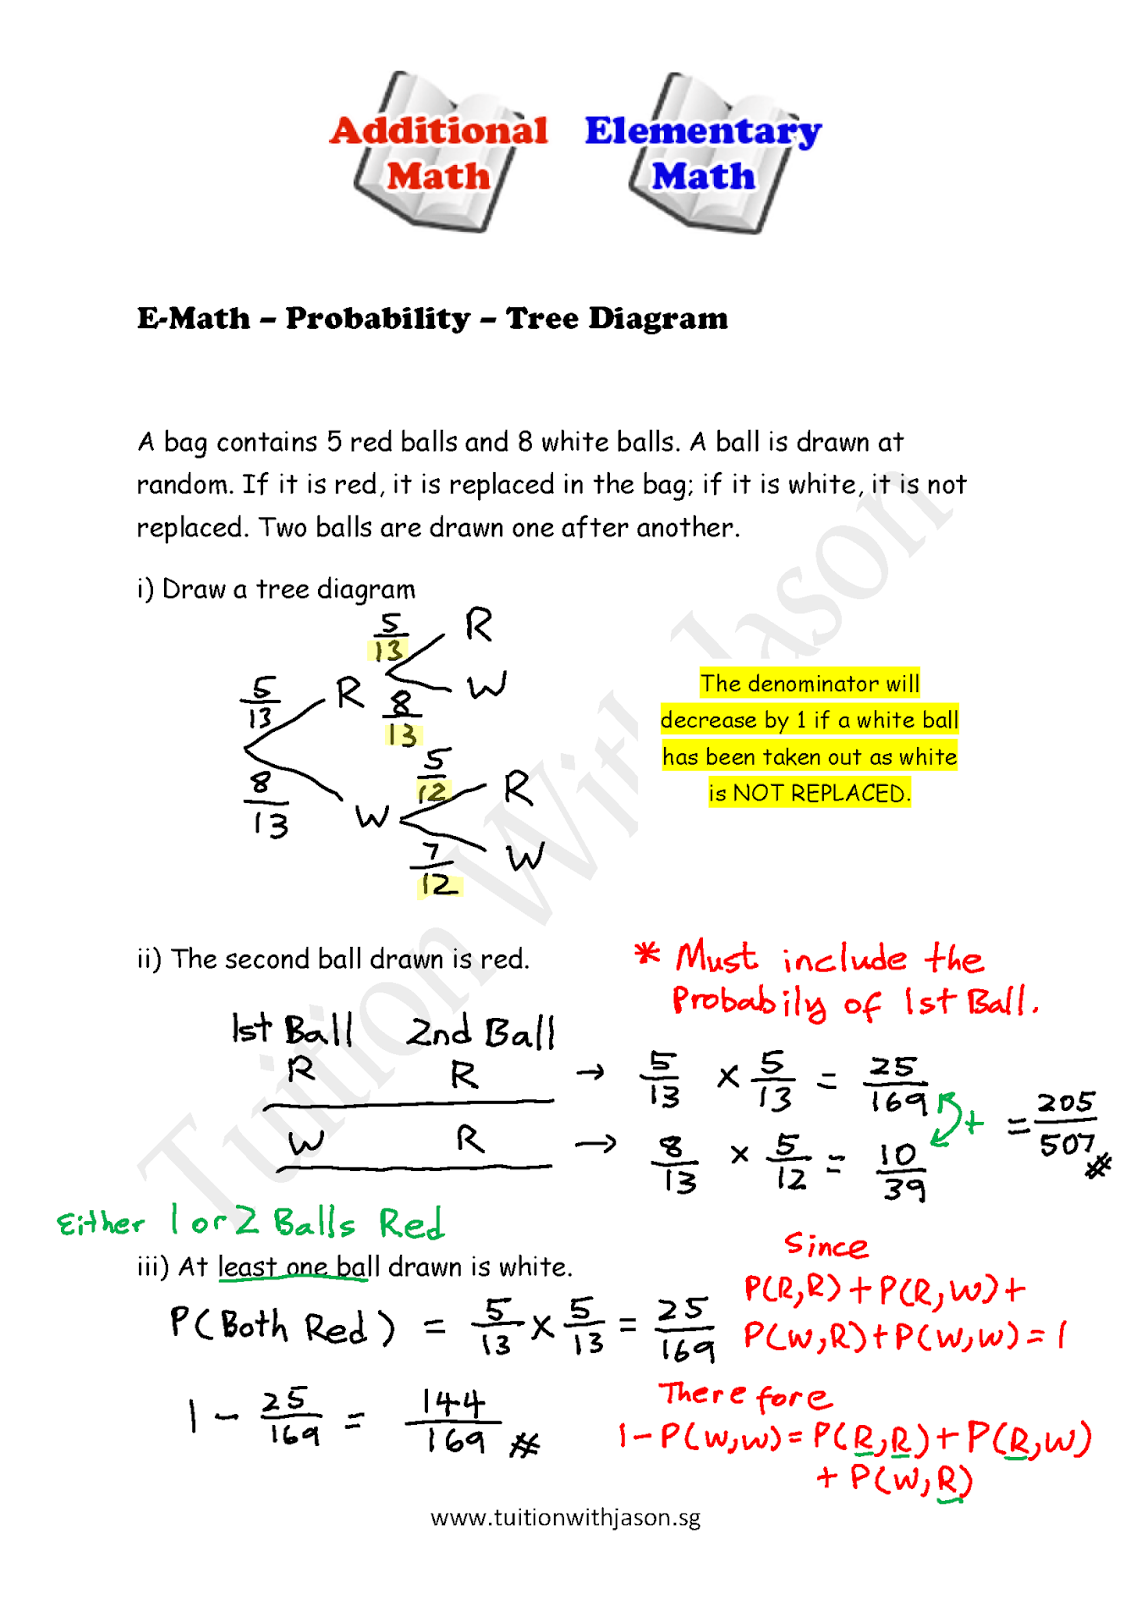 E-math- Probability